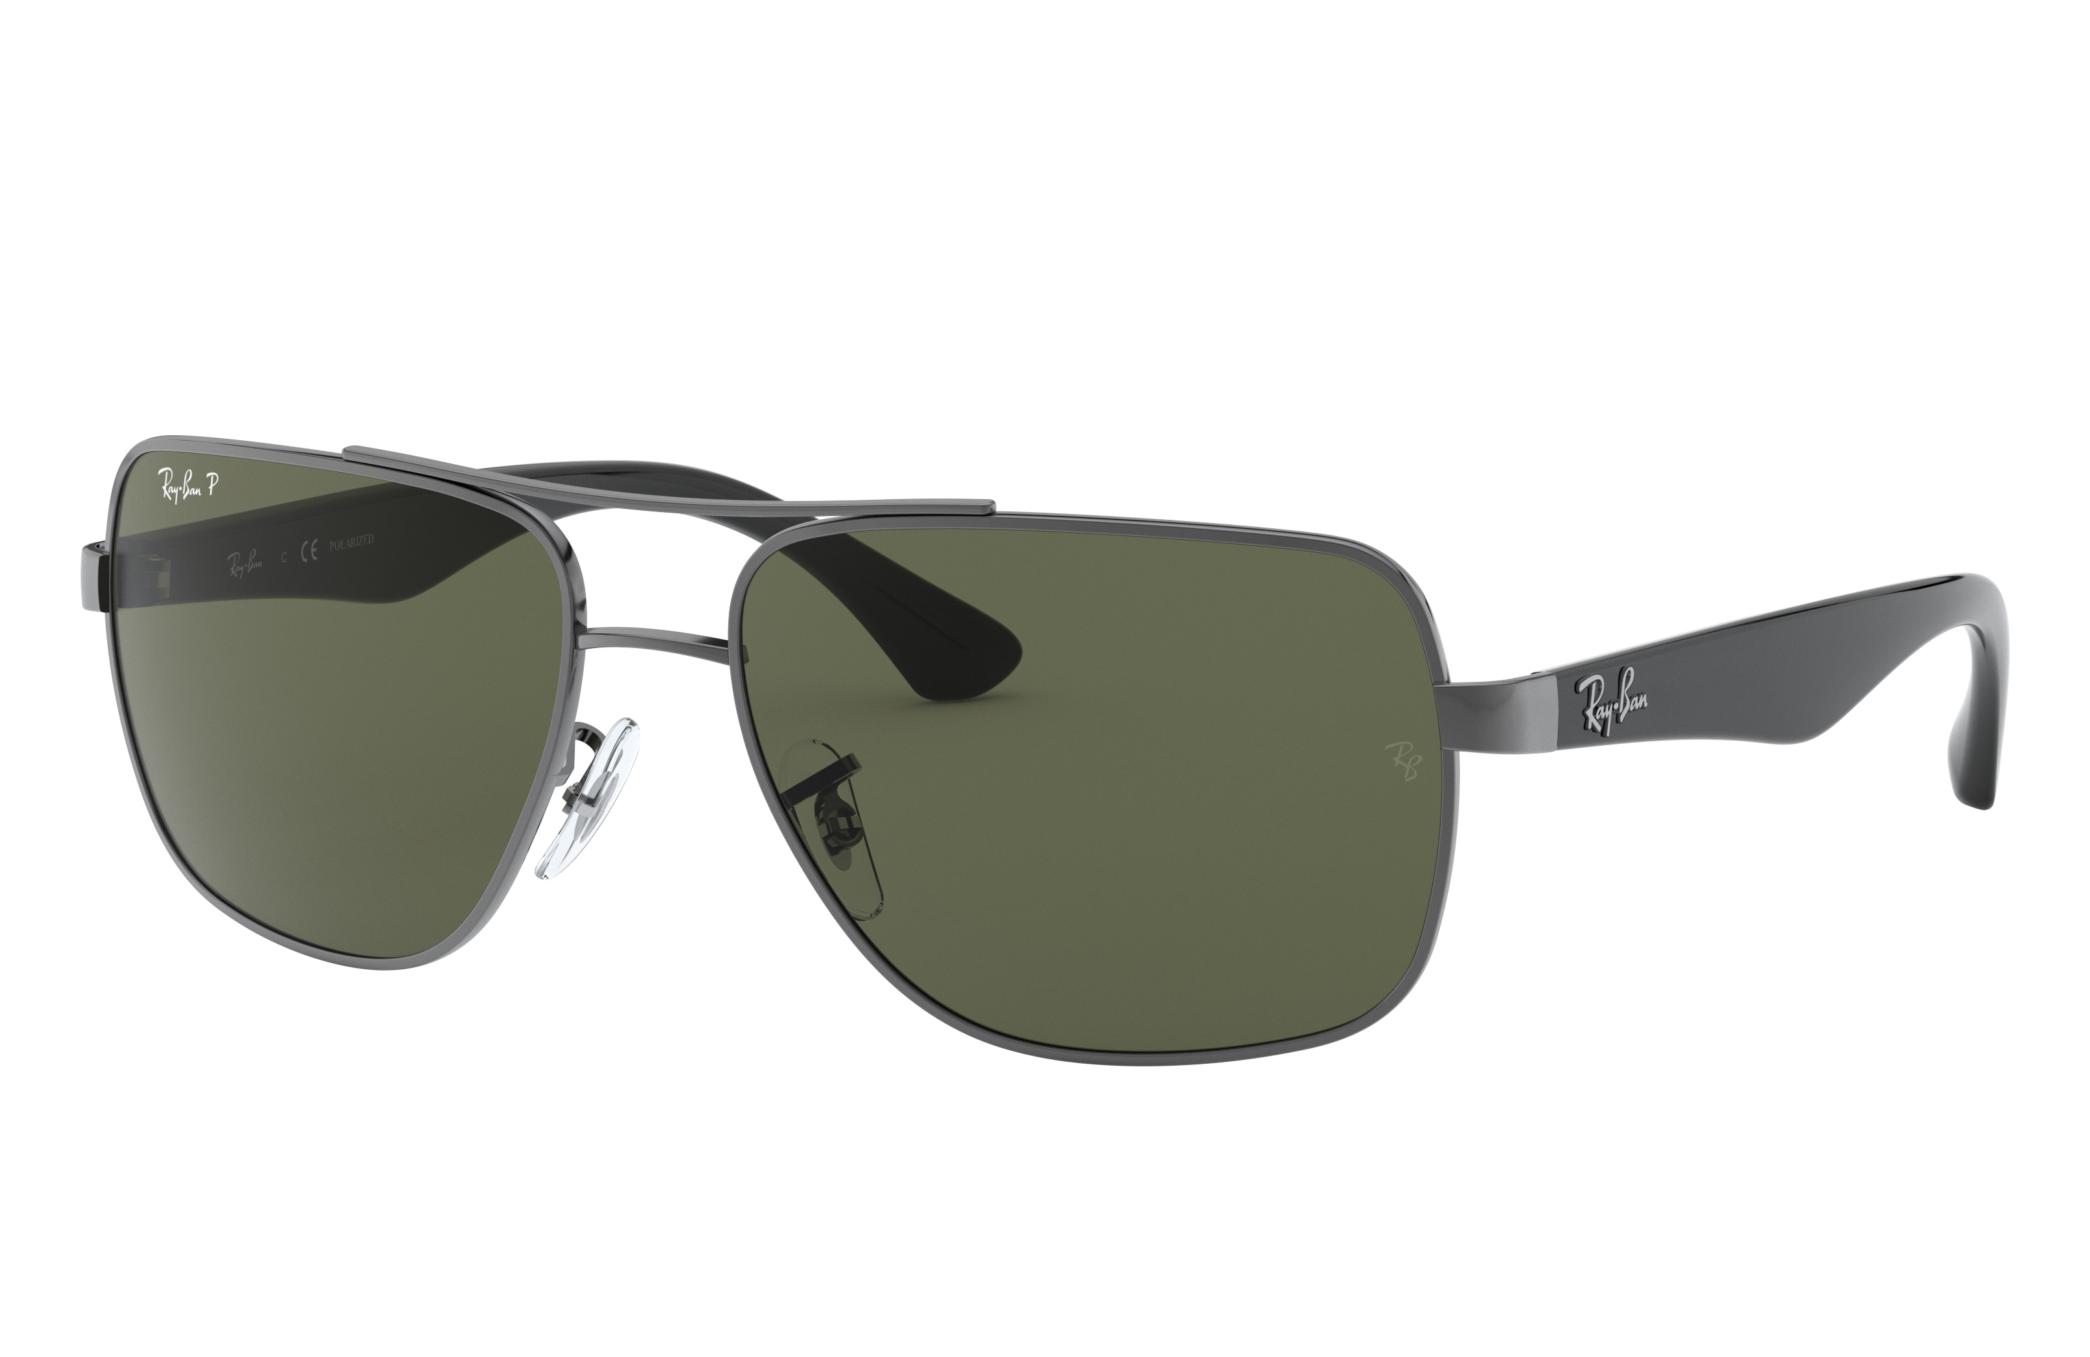 Ray-Ban Rb3483 Black, Polarized Green Lenses - RB3483